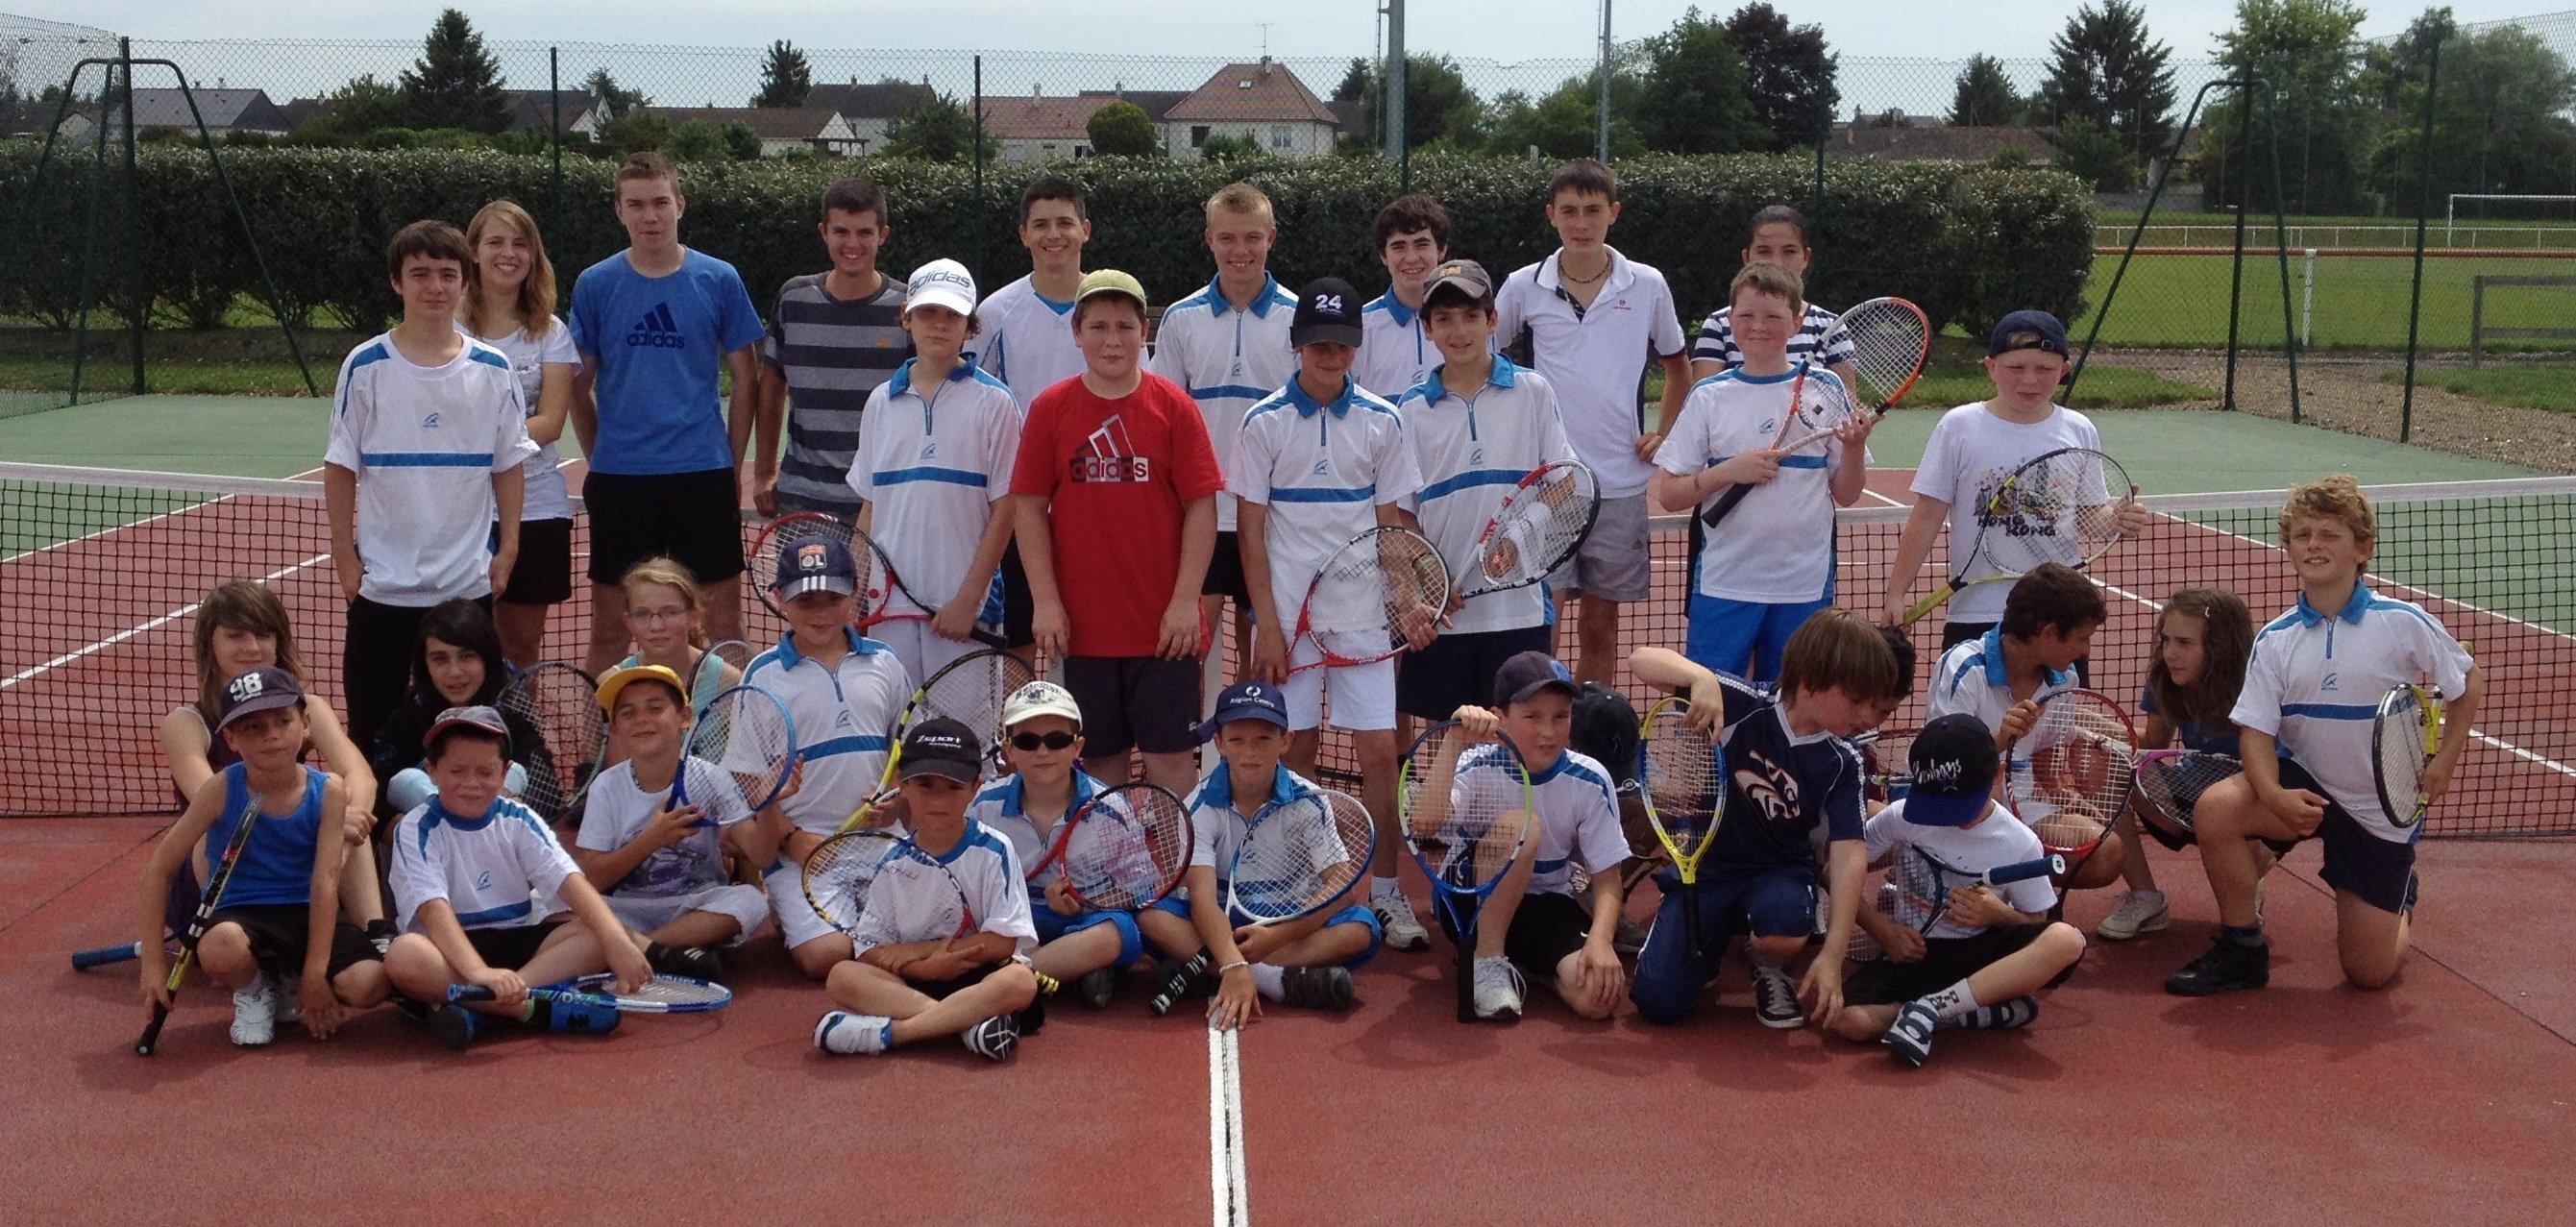 Tournoi interieur tennis club attegien for Club de tennis interieur saguenay